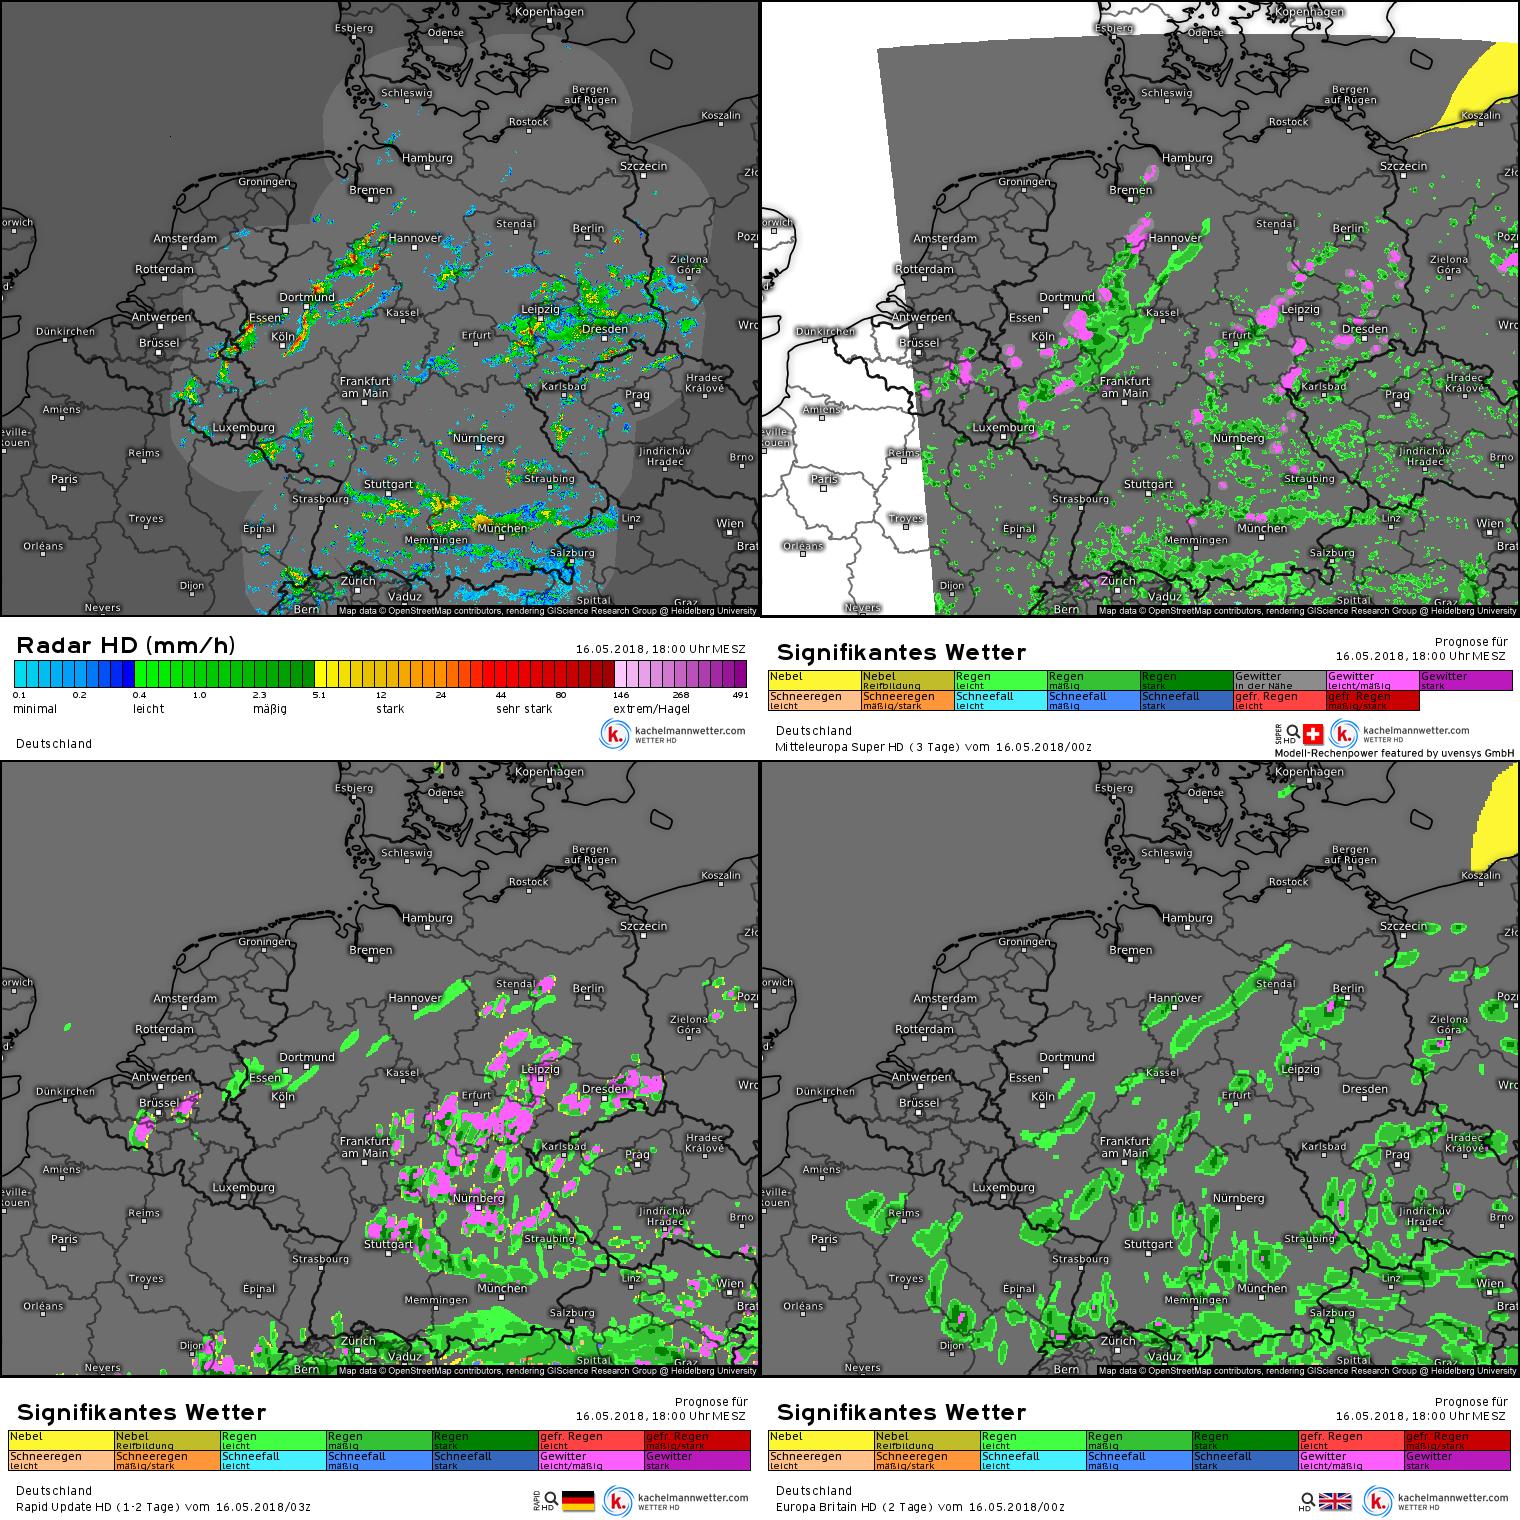 WX_D_models_vs_Radar_180516_00z+16h